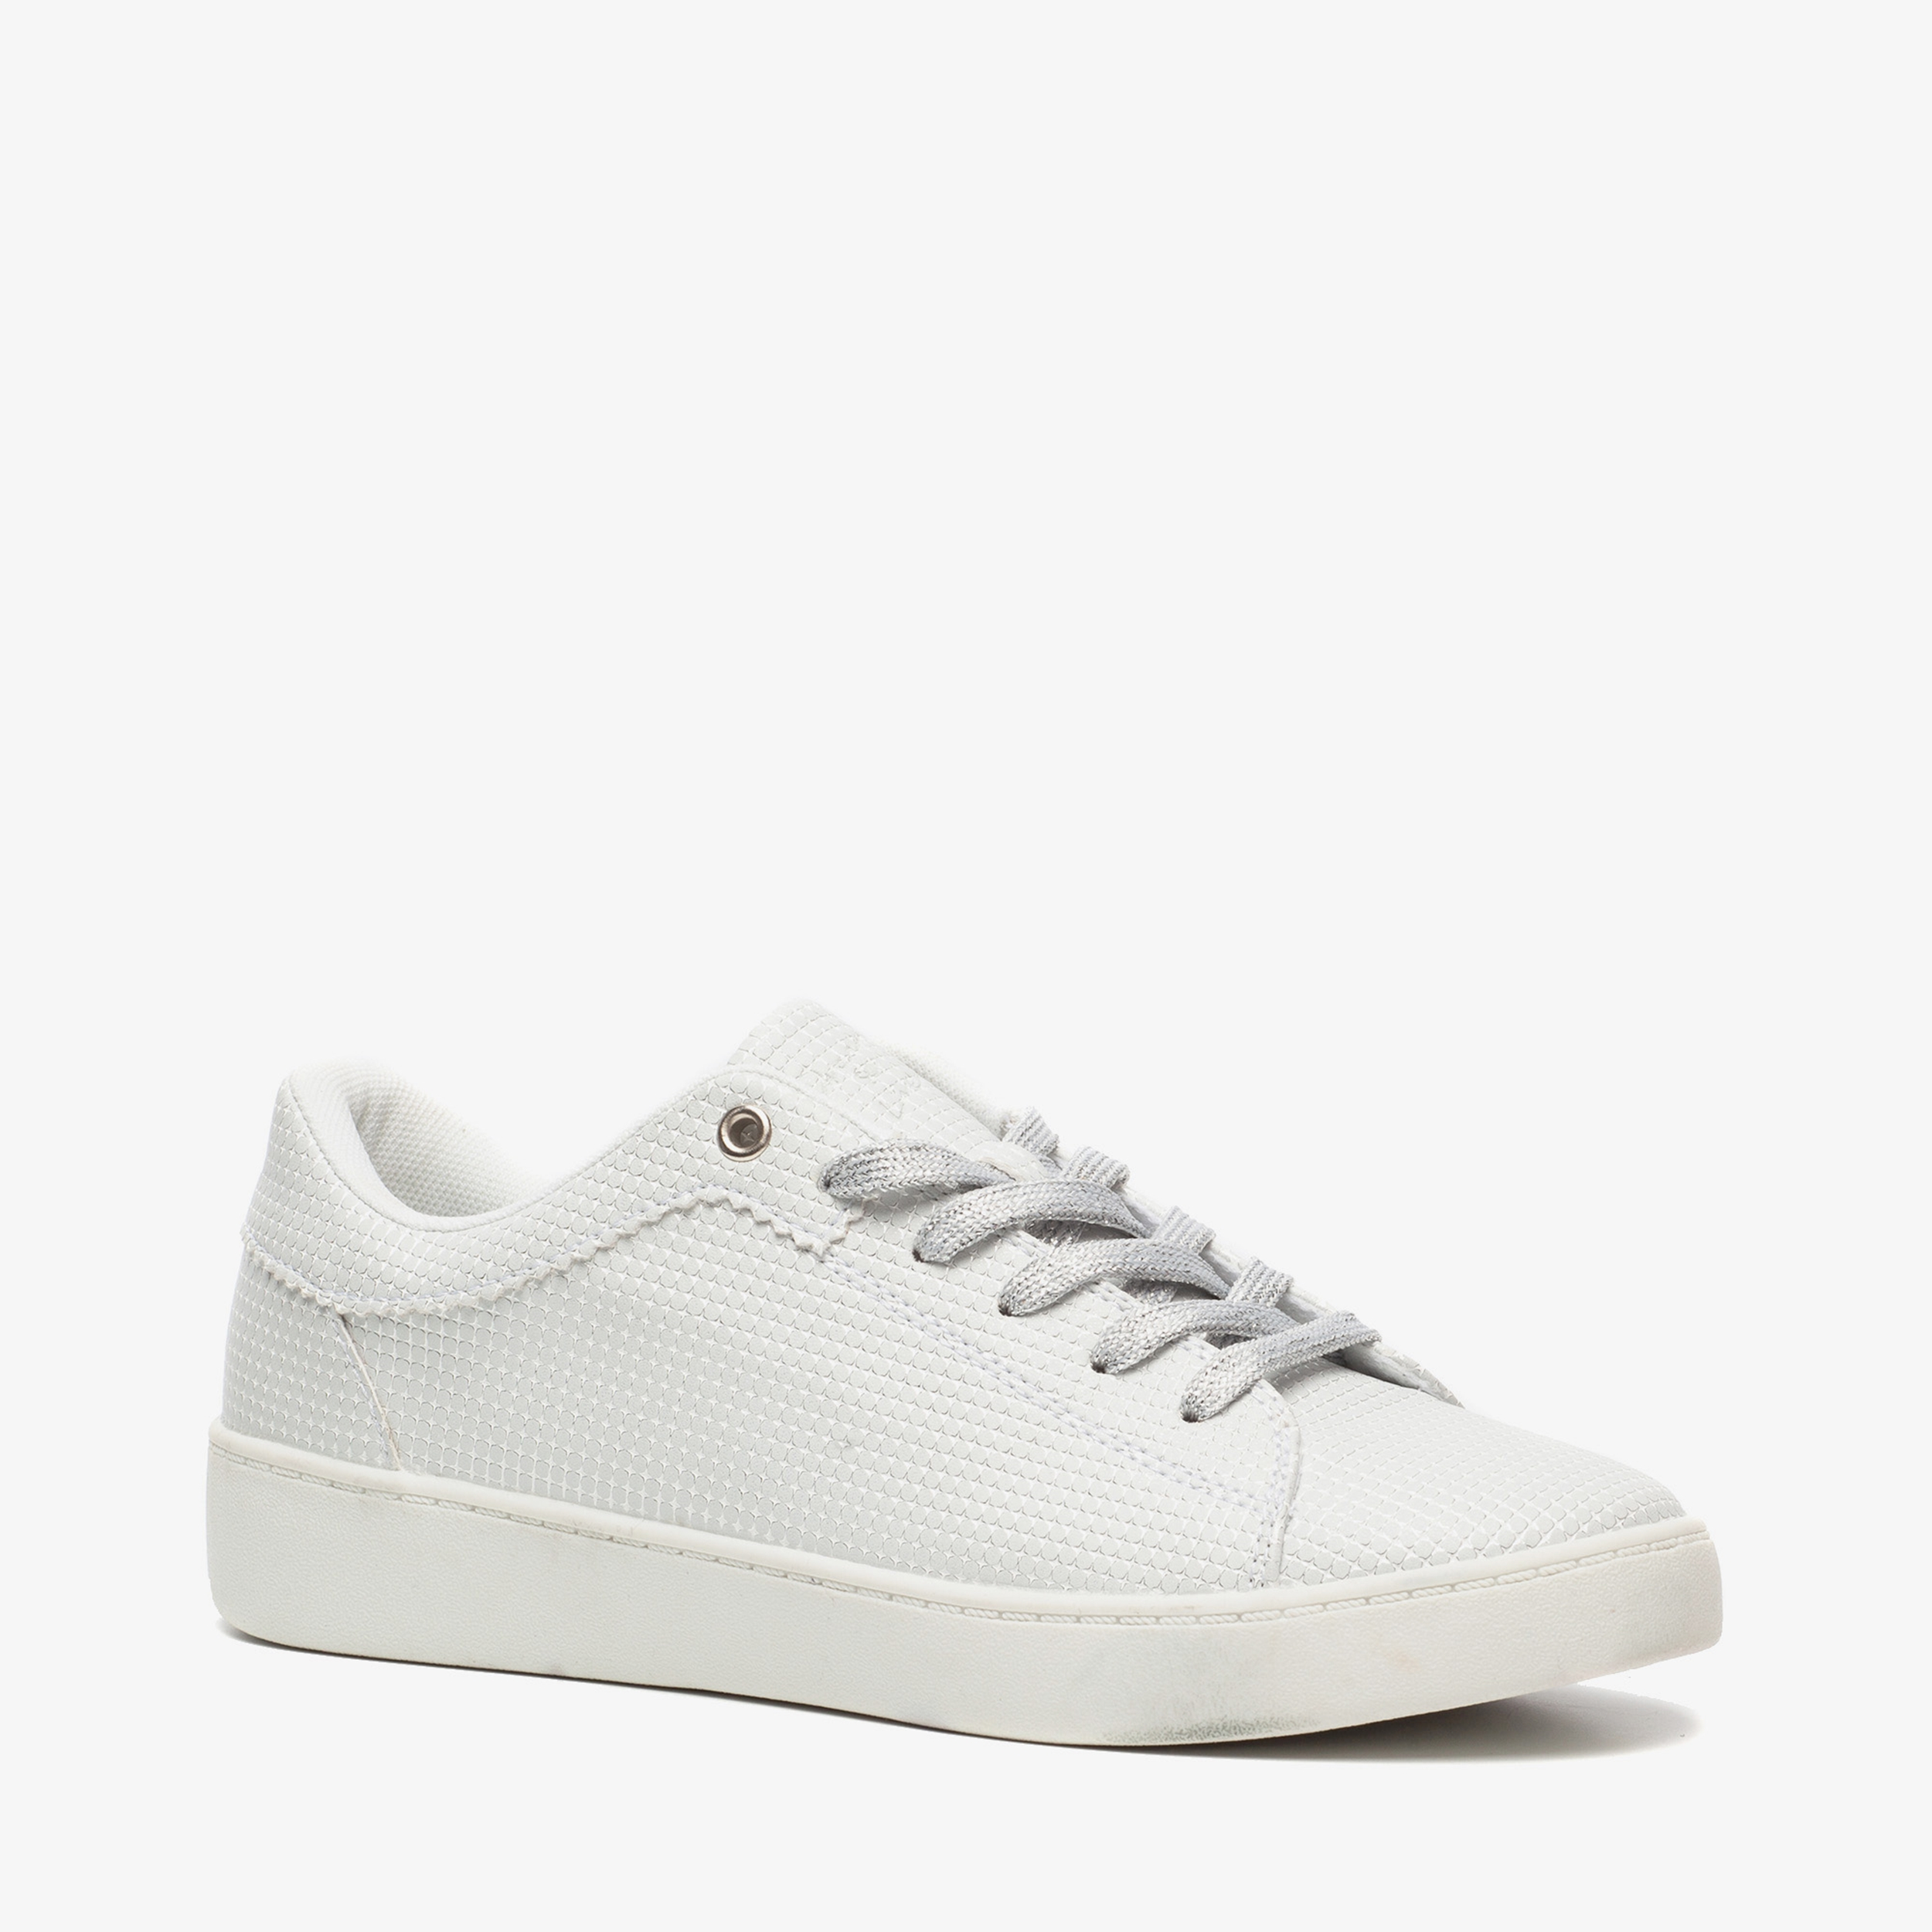 Blue Box dames sneakers met bloemenprint Wit Maat 39